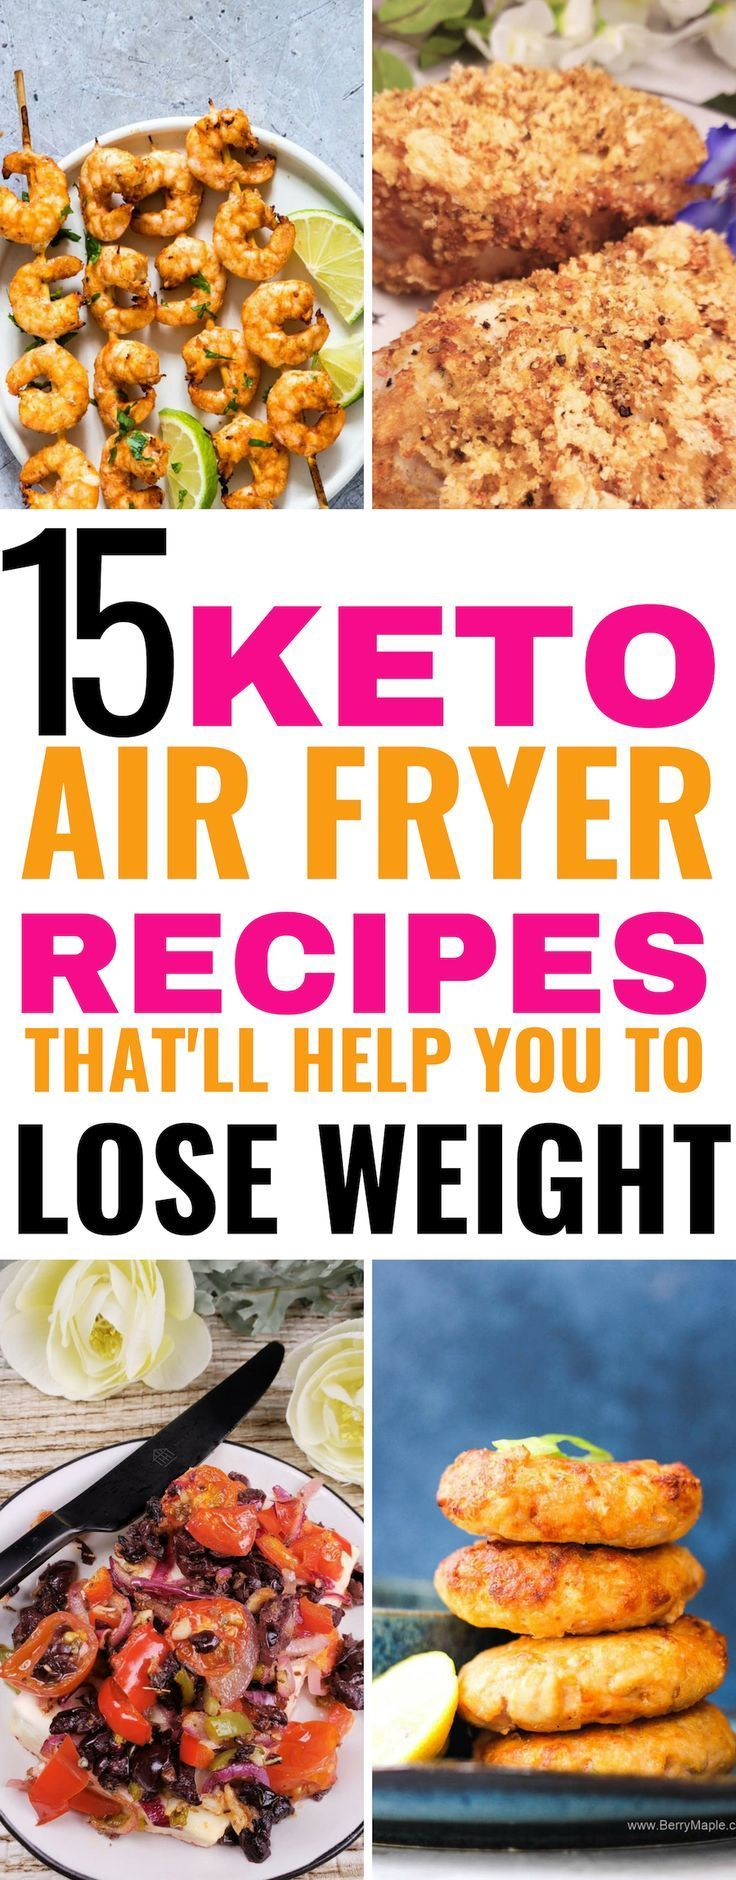 15 Keto Air Fryer Recipes That Are Quick, Easy & Healthy - Meraadi #airfryerrecipes